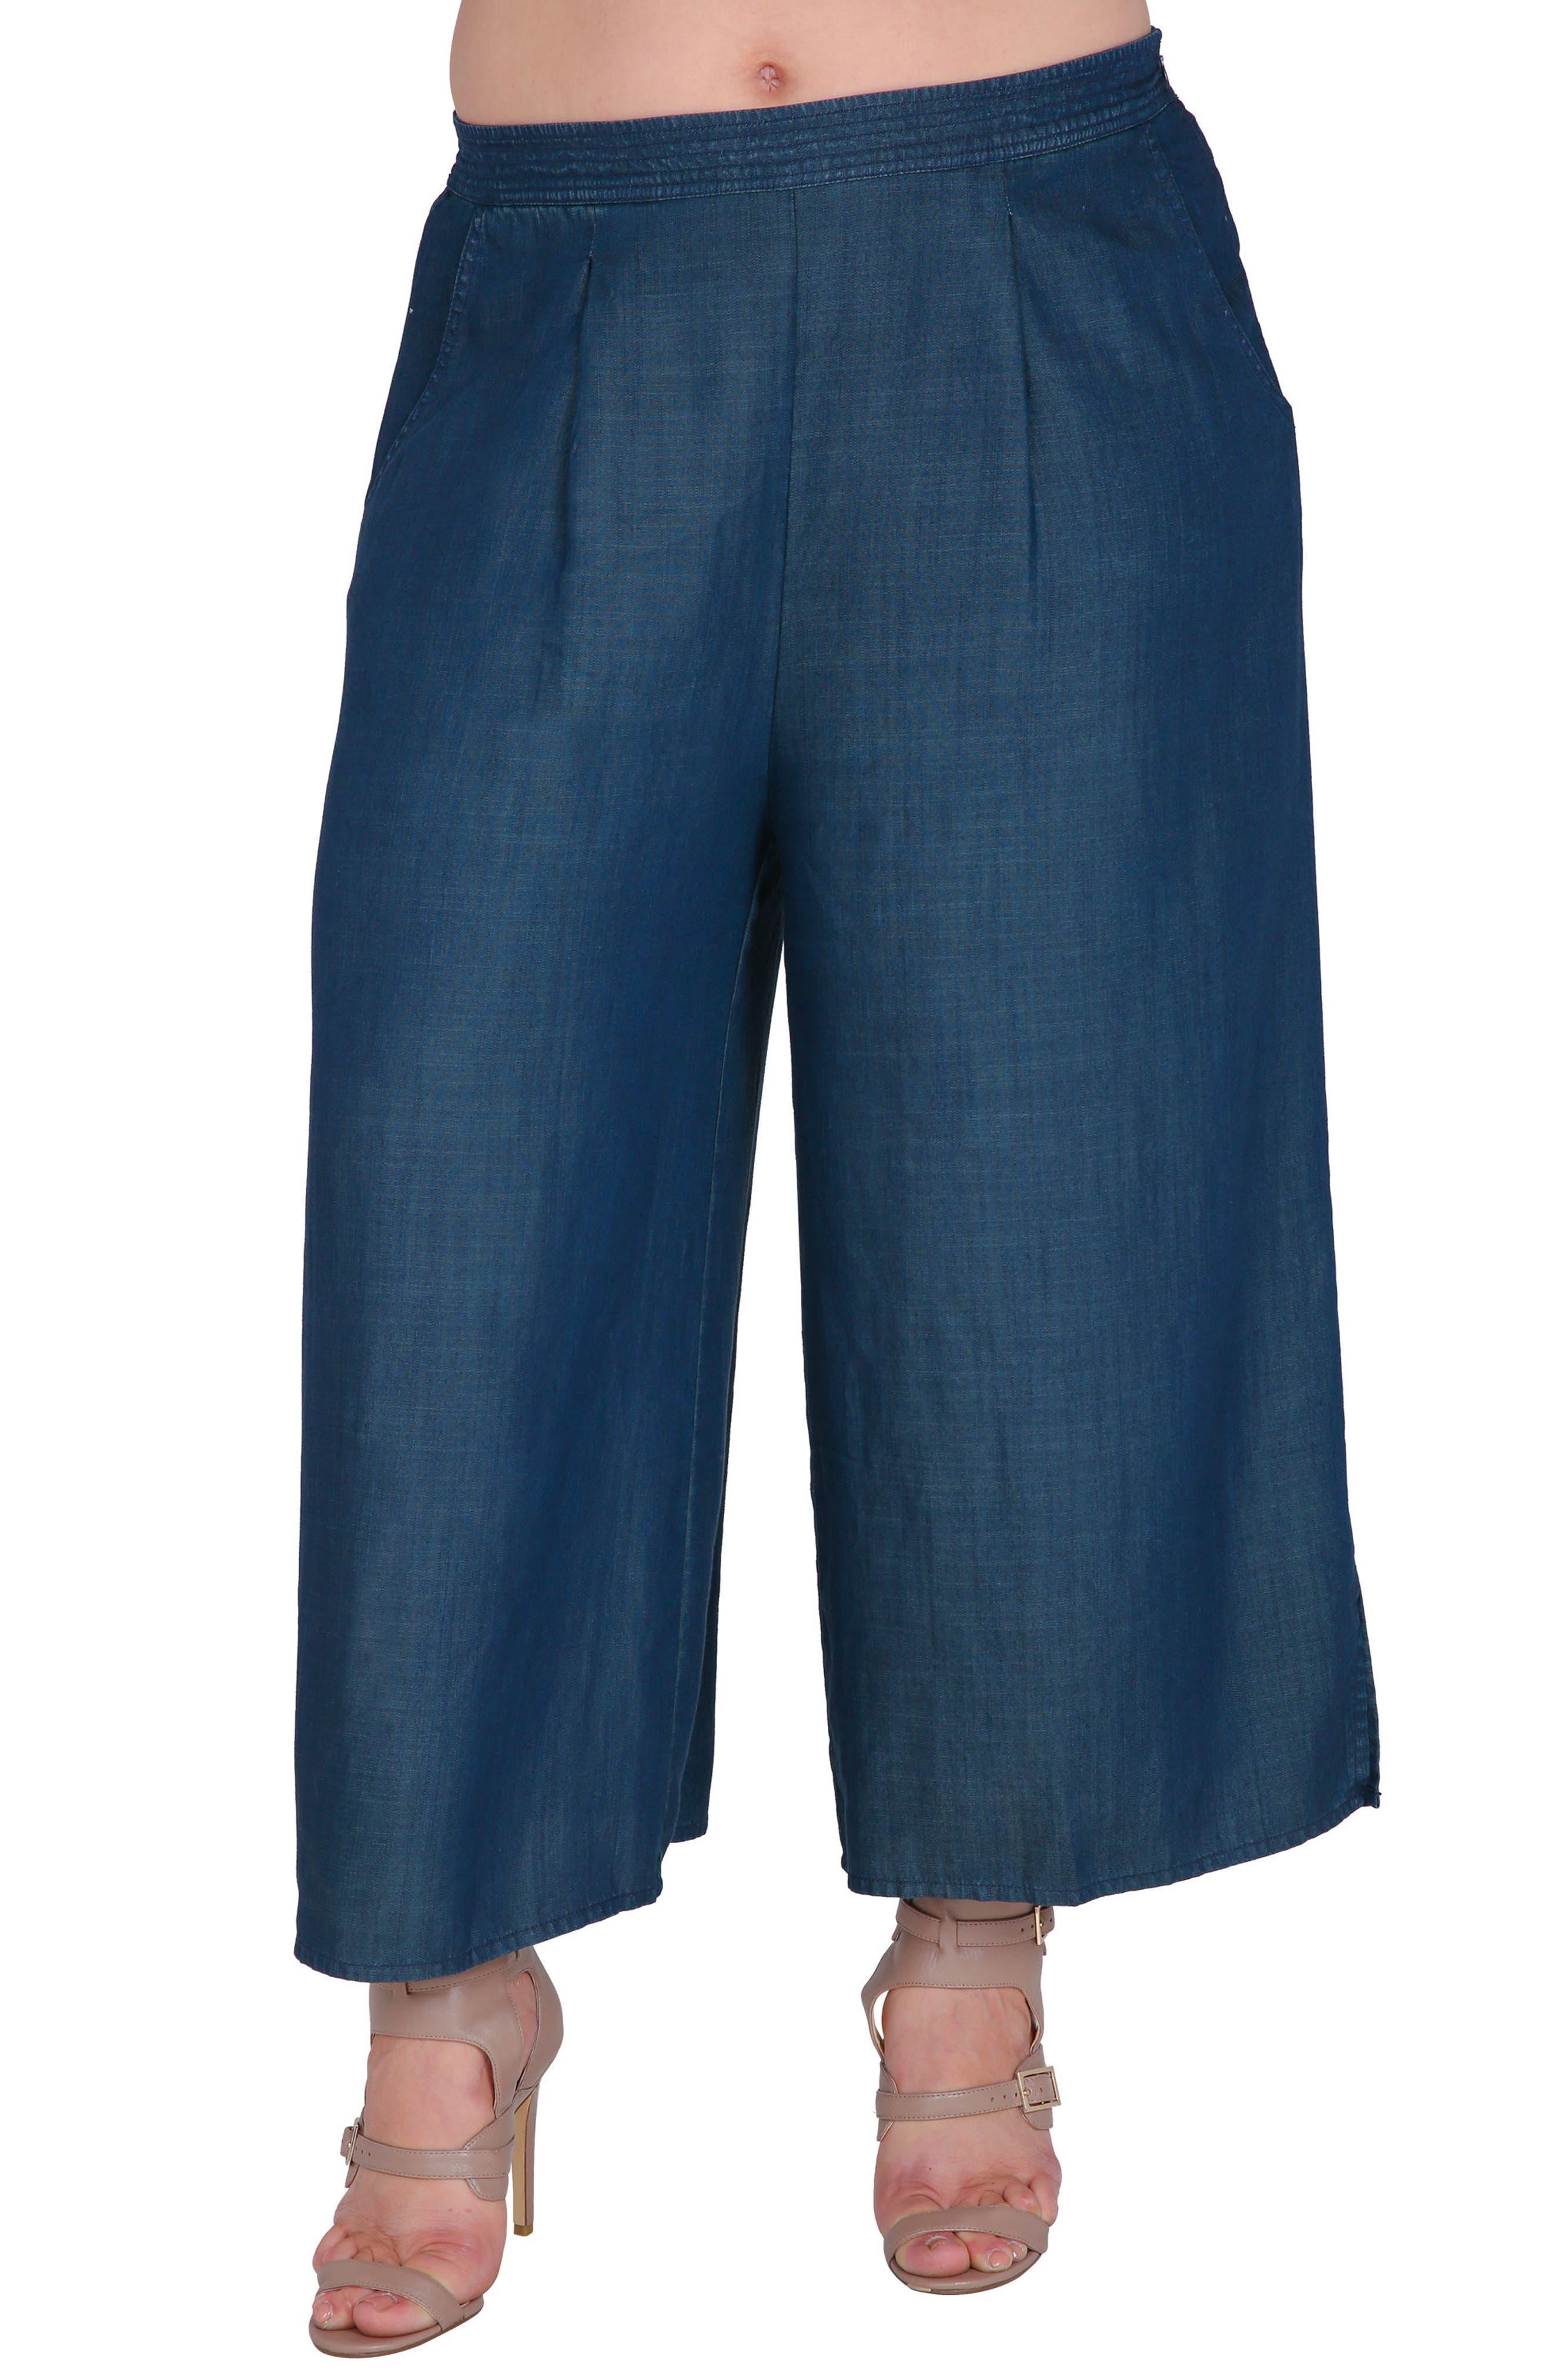 Standards & Practices Diana Tencel® Palazzo Pants (Plus Size)